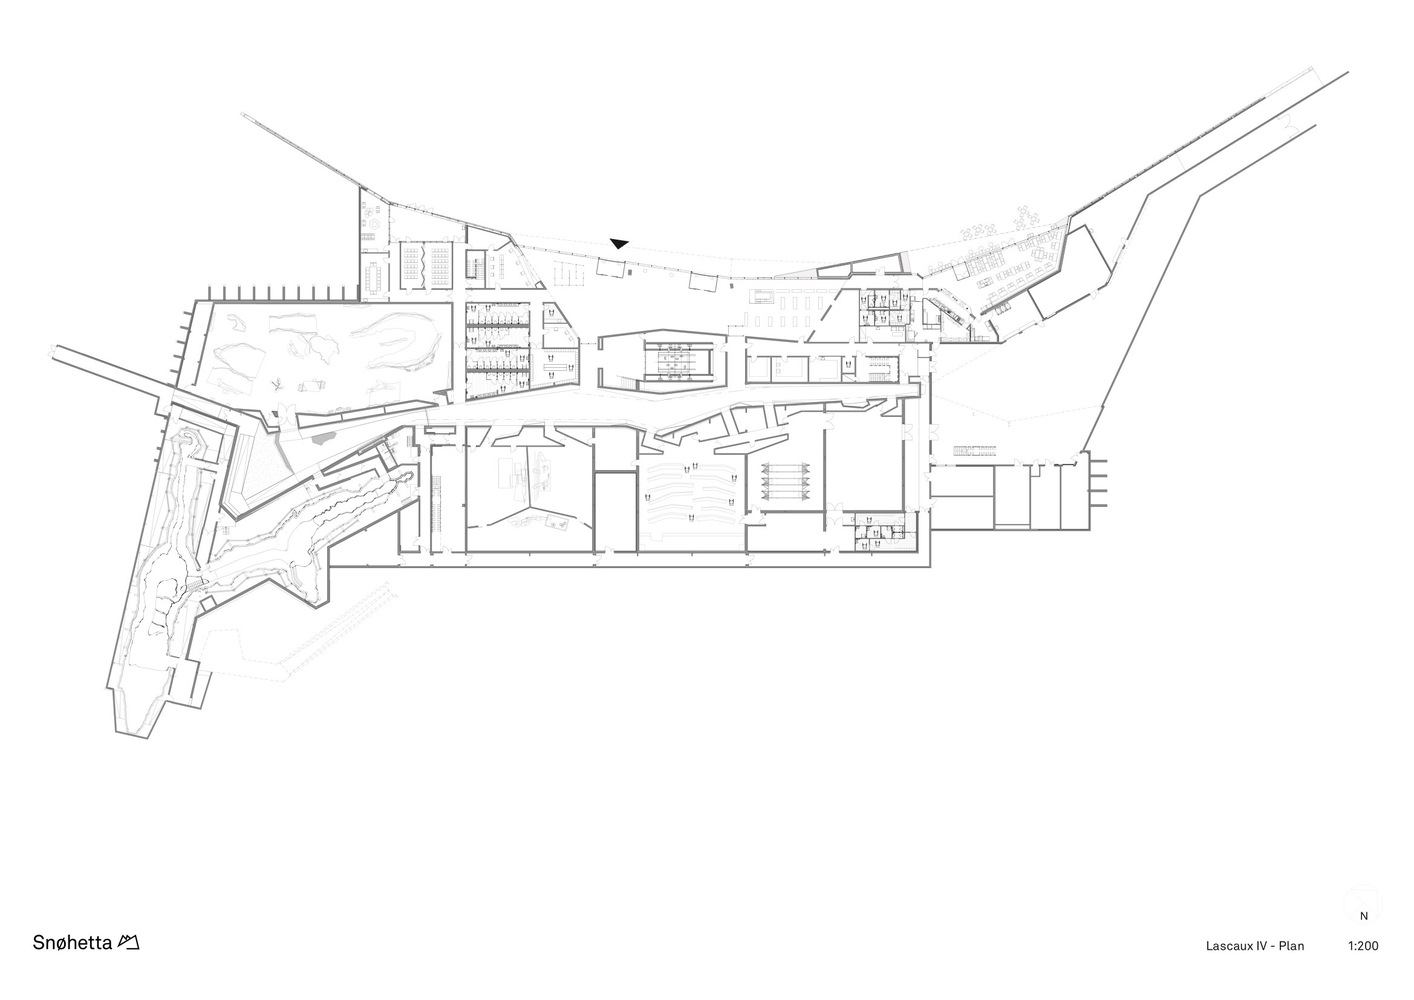 gallery of lascaux iv sn hetta duncan lewis scape architecture 39 Flat 4 Wiring Diagram lascaux iv sn hetta duncan lewis scape architecture diagram